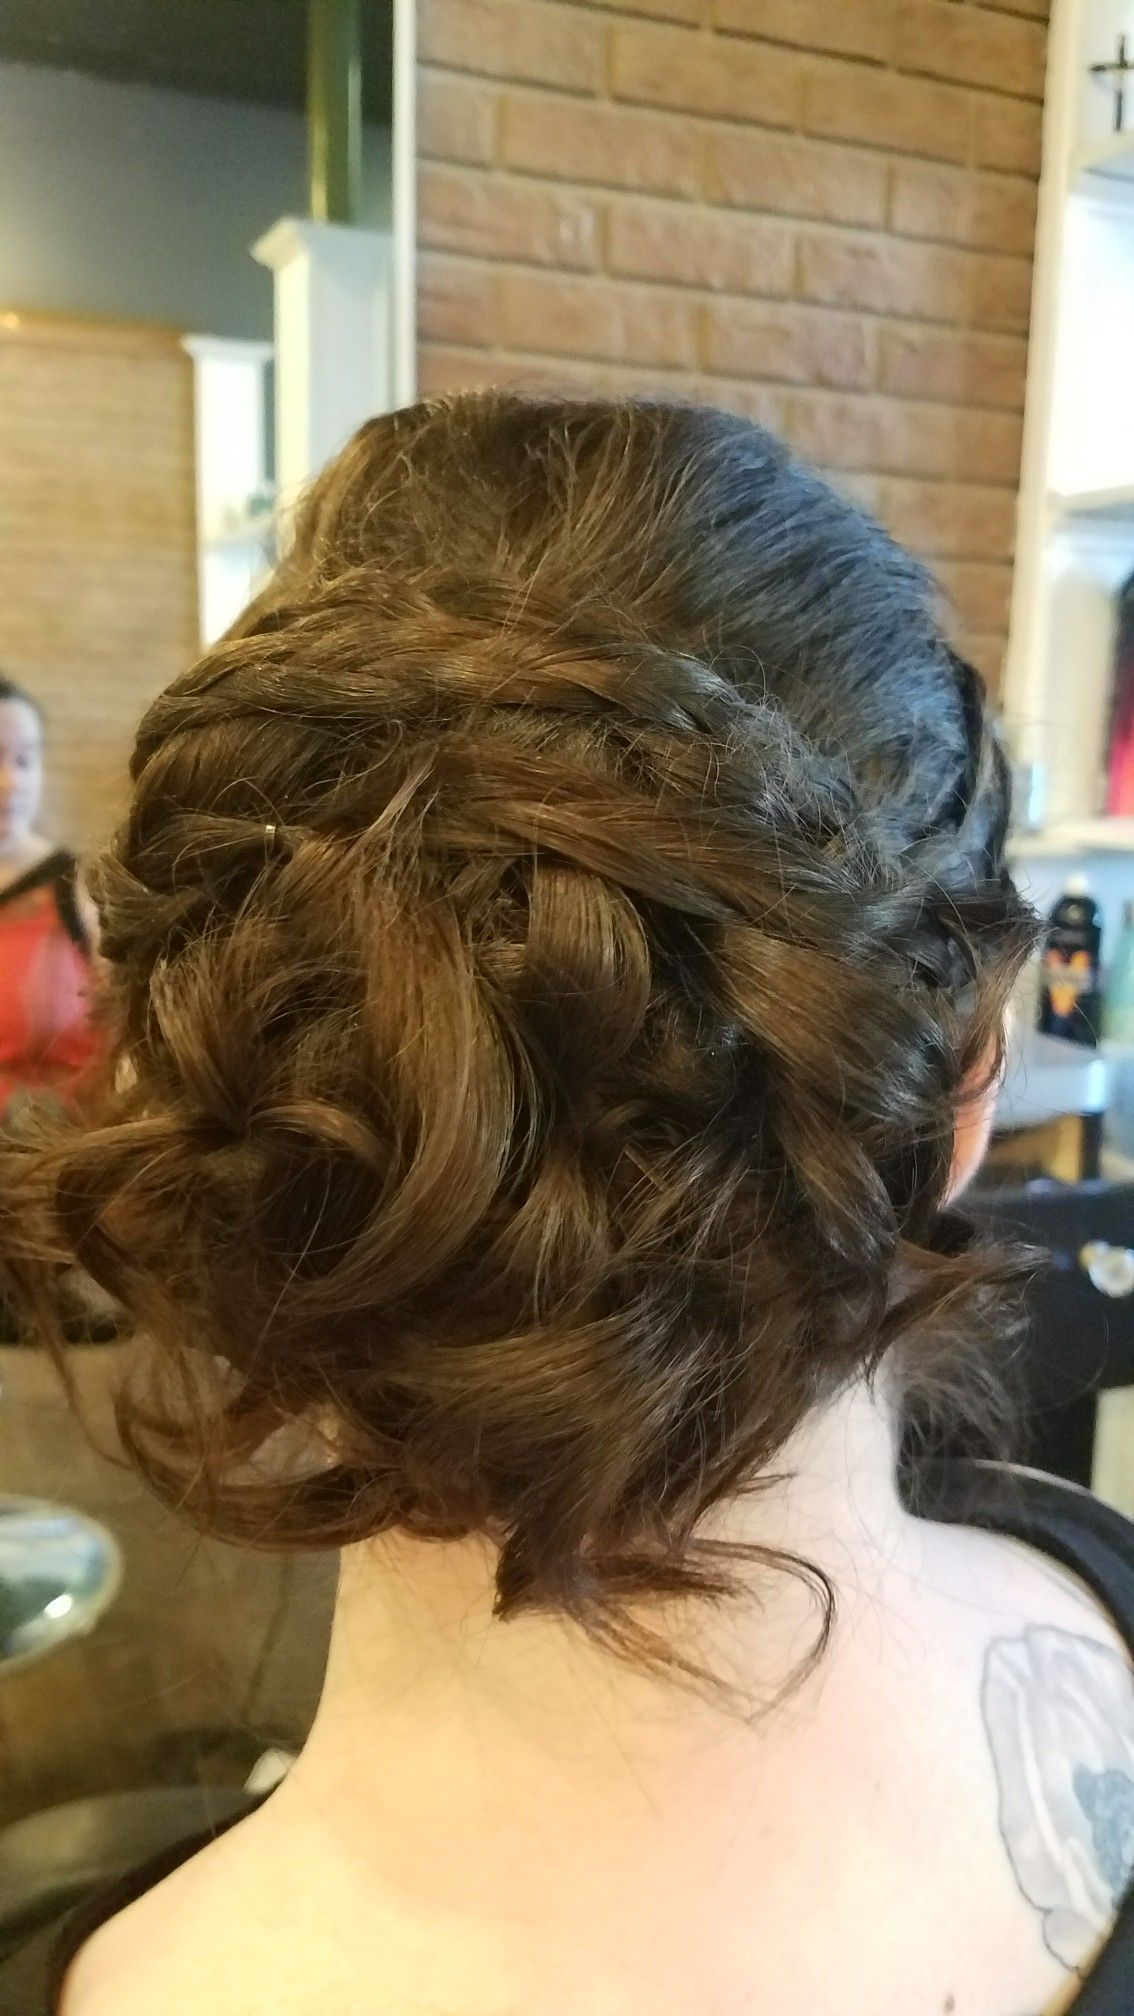 Bridal hair trial at salon bangles in springfieldnj salonbangles